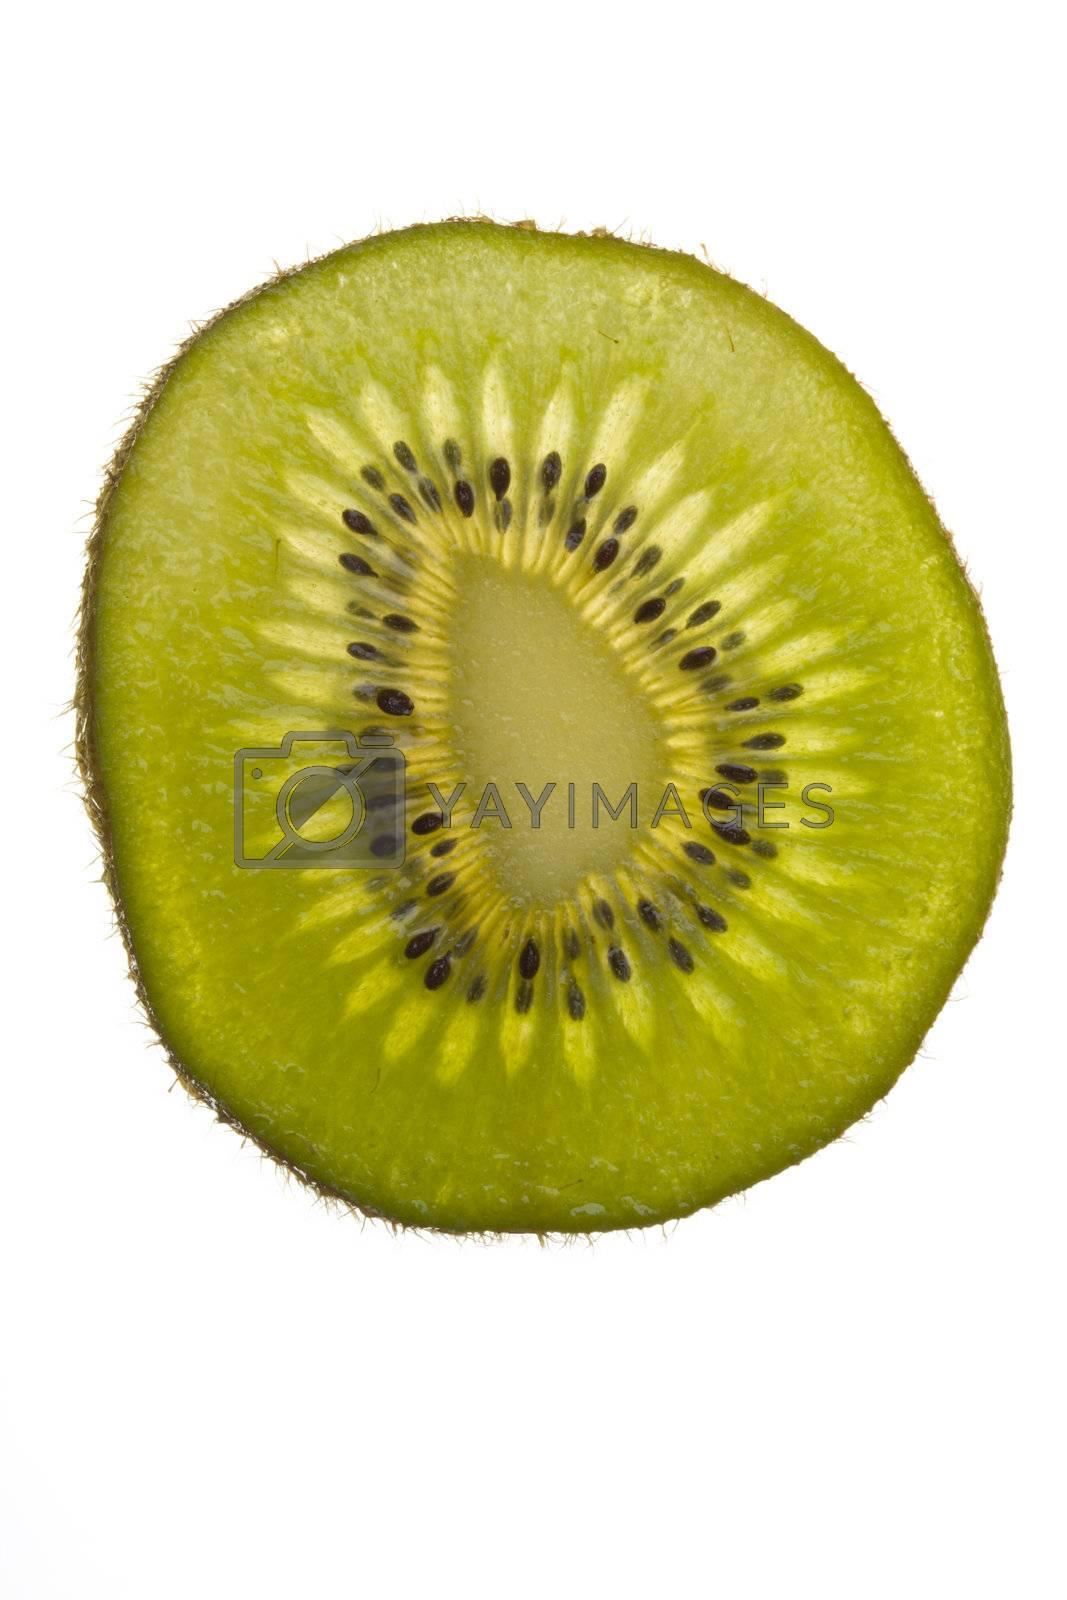 closeup of a translucent slice of kiwi